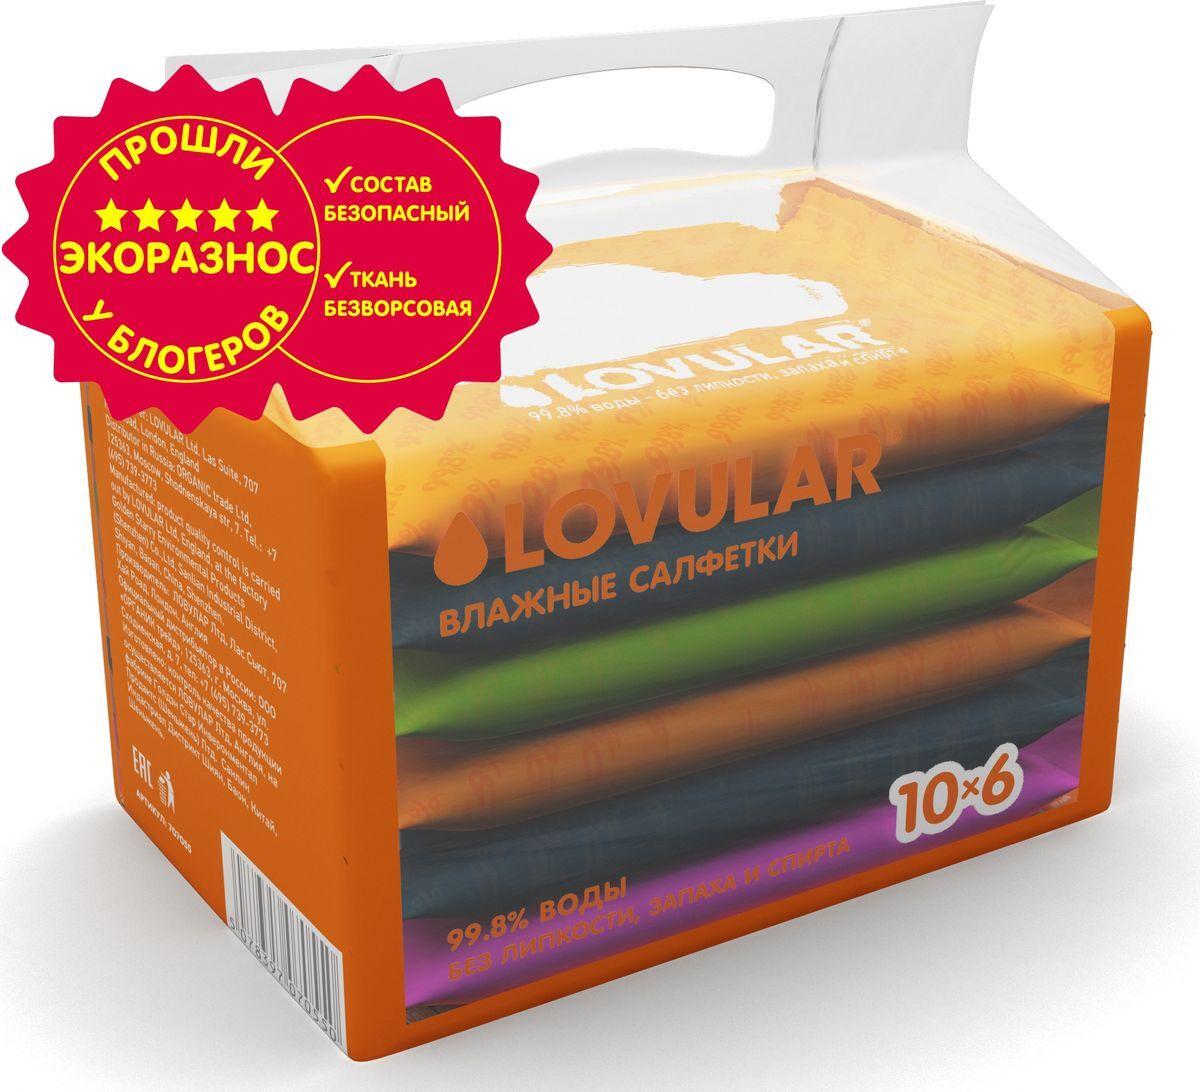 Влажные салфетки Lovular, 6 х 10 шт #1